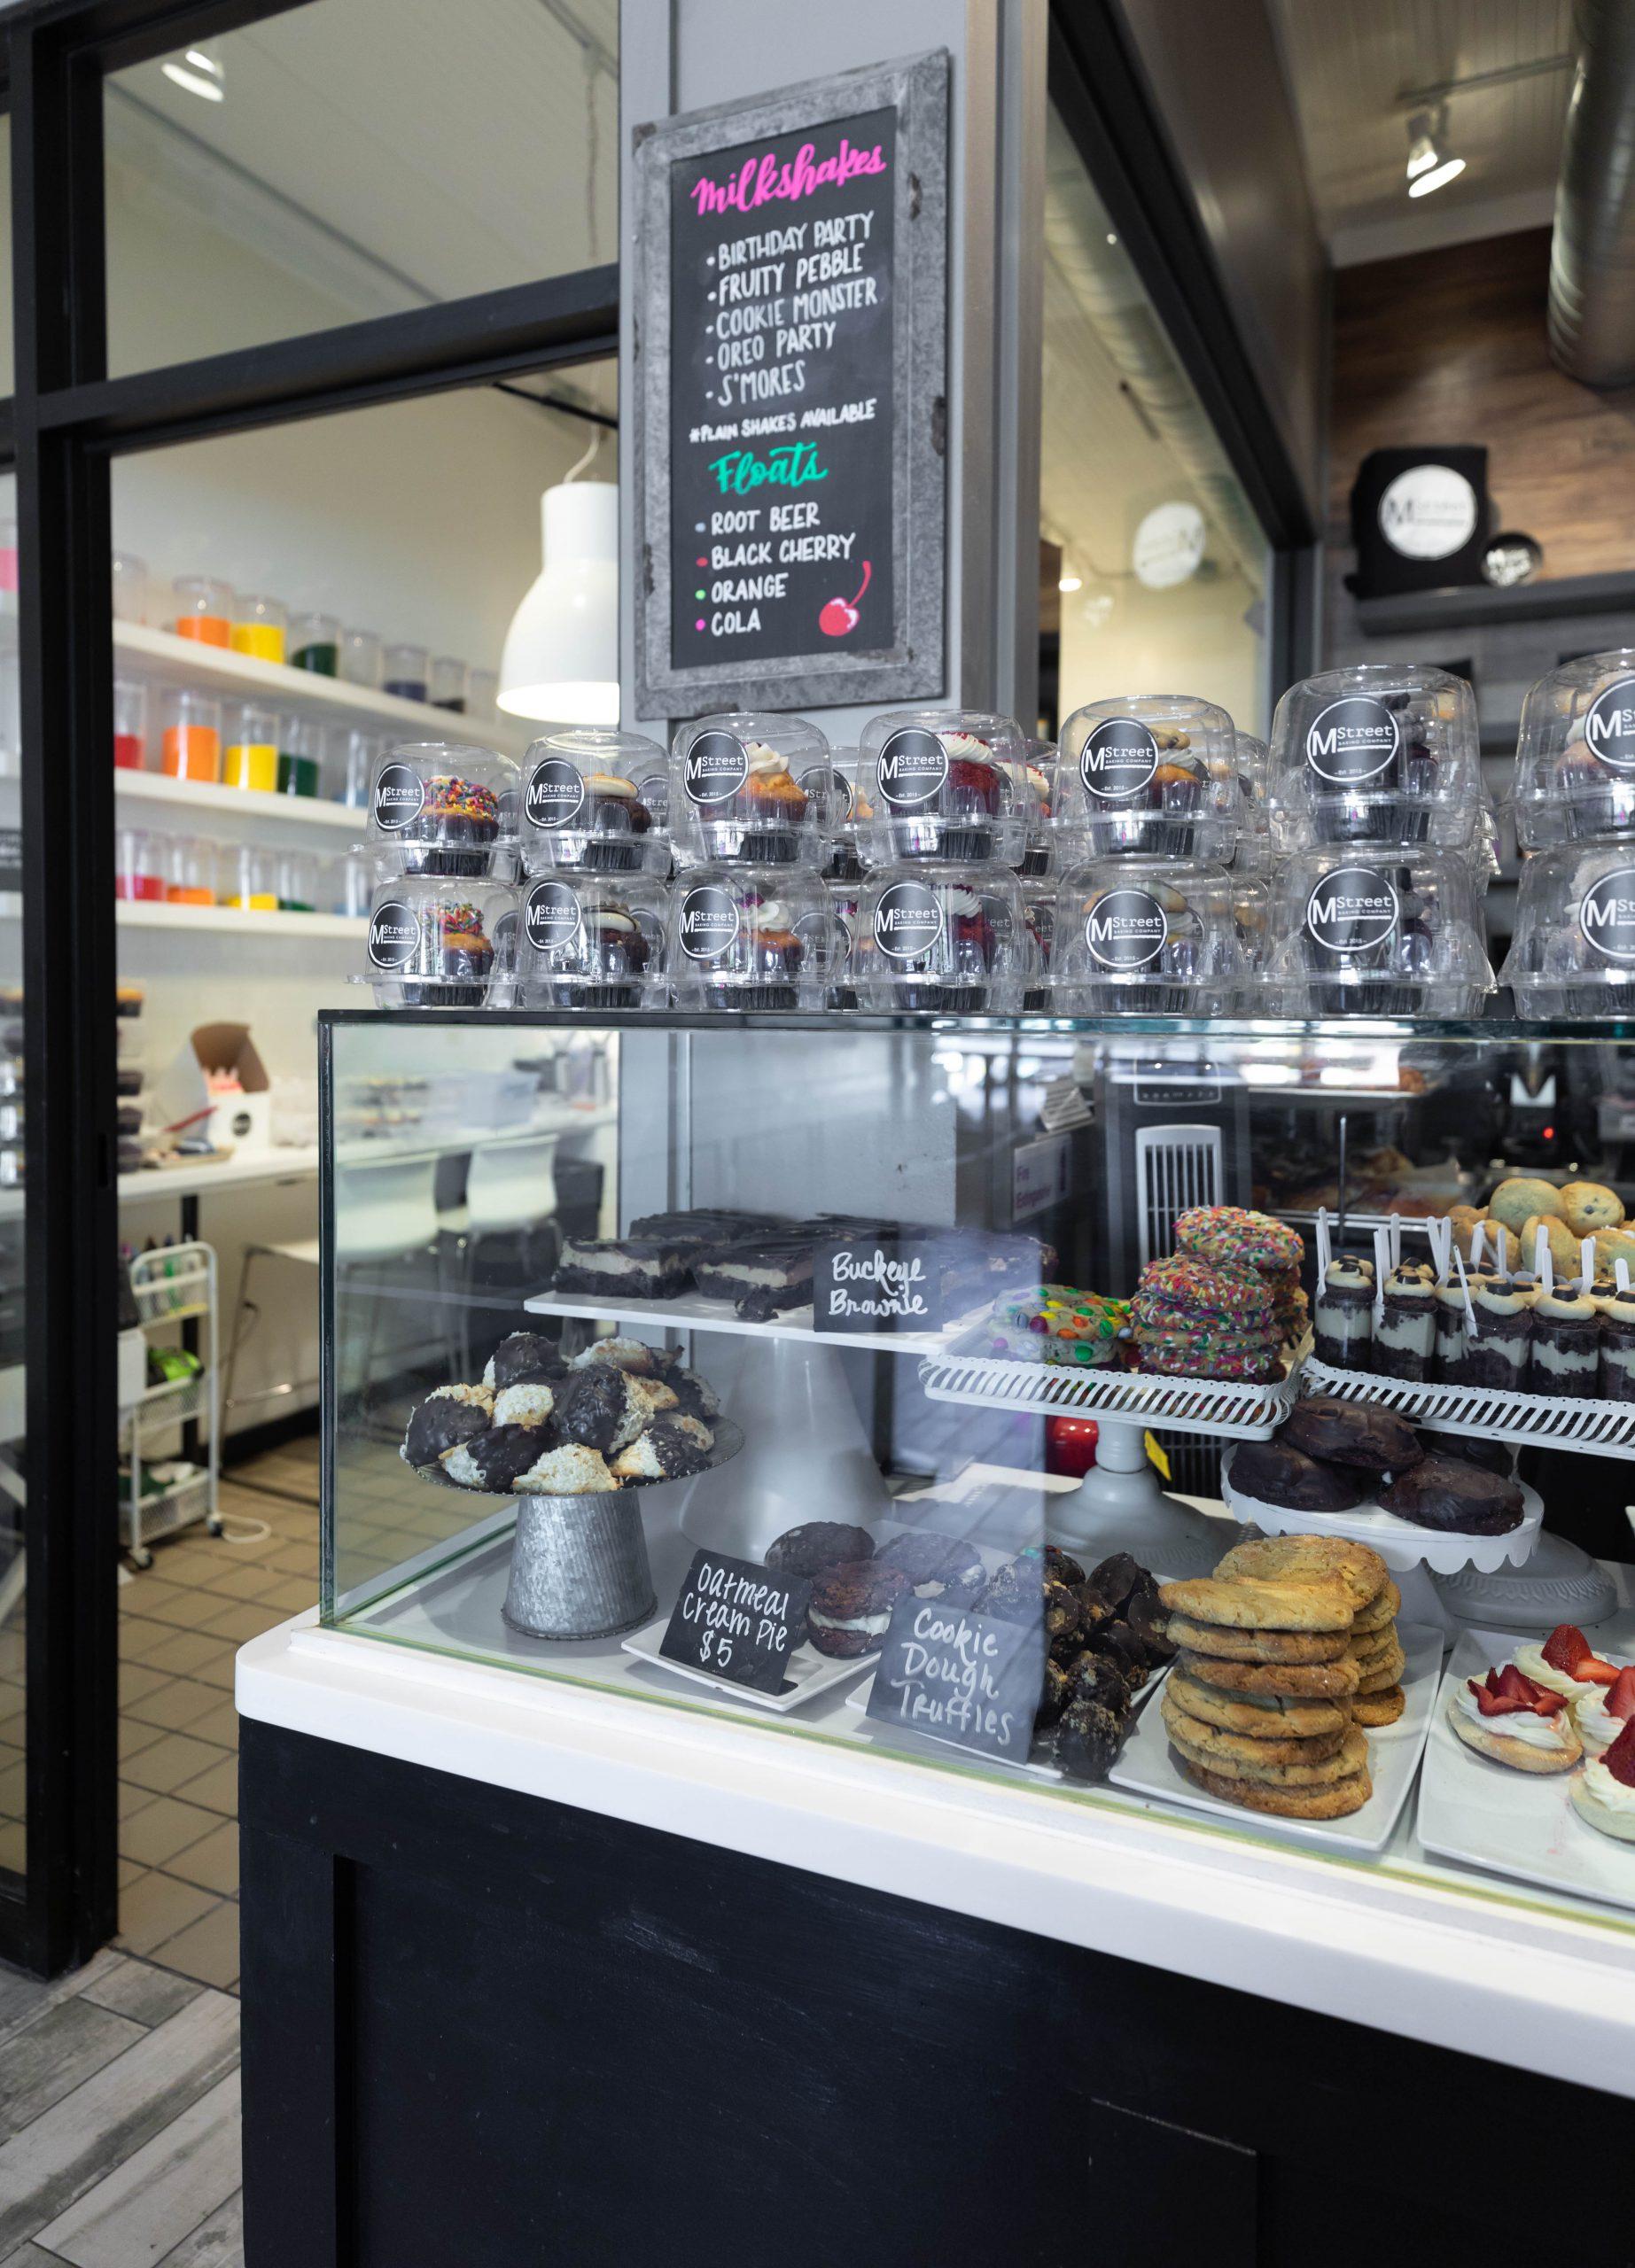 M Street Baking Co in Howell Michigan by Annie Fairfax